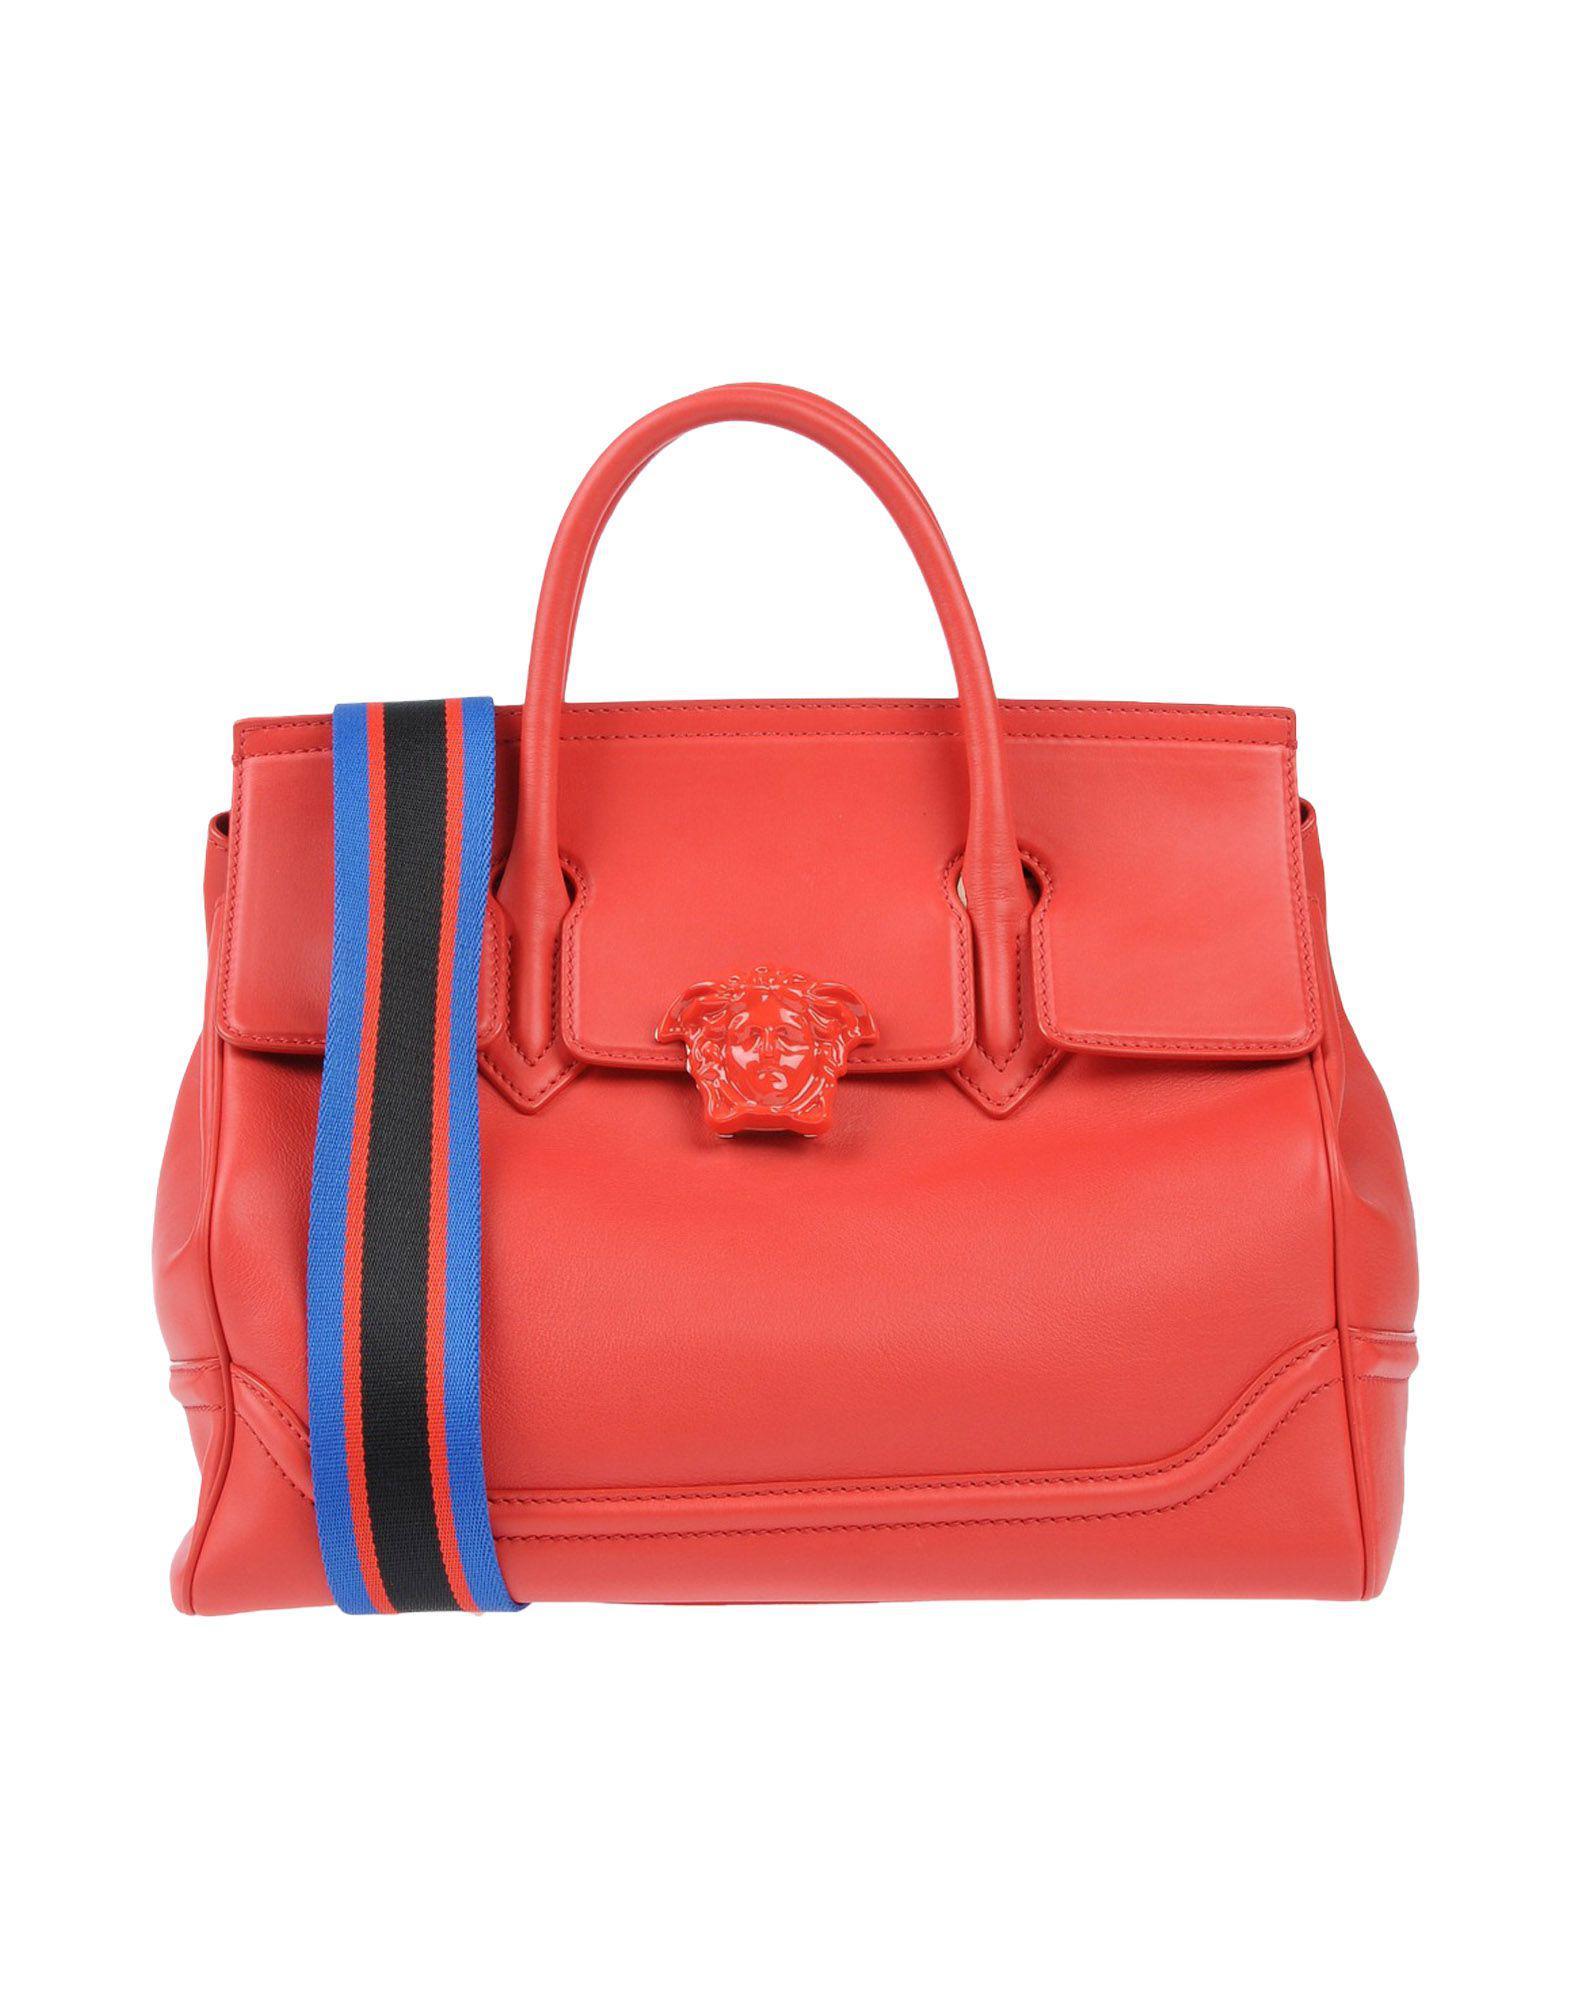 Lyst - Versace Handbag in Red f3bb336743415